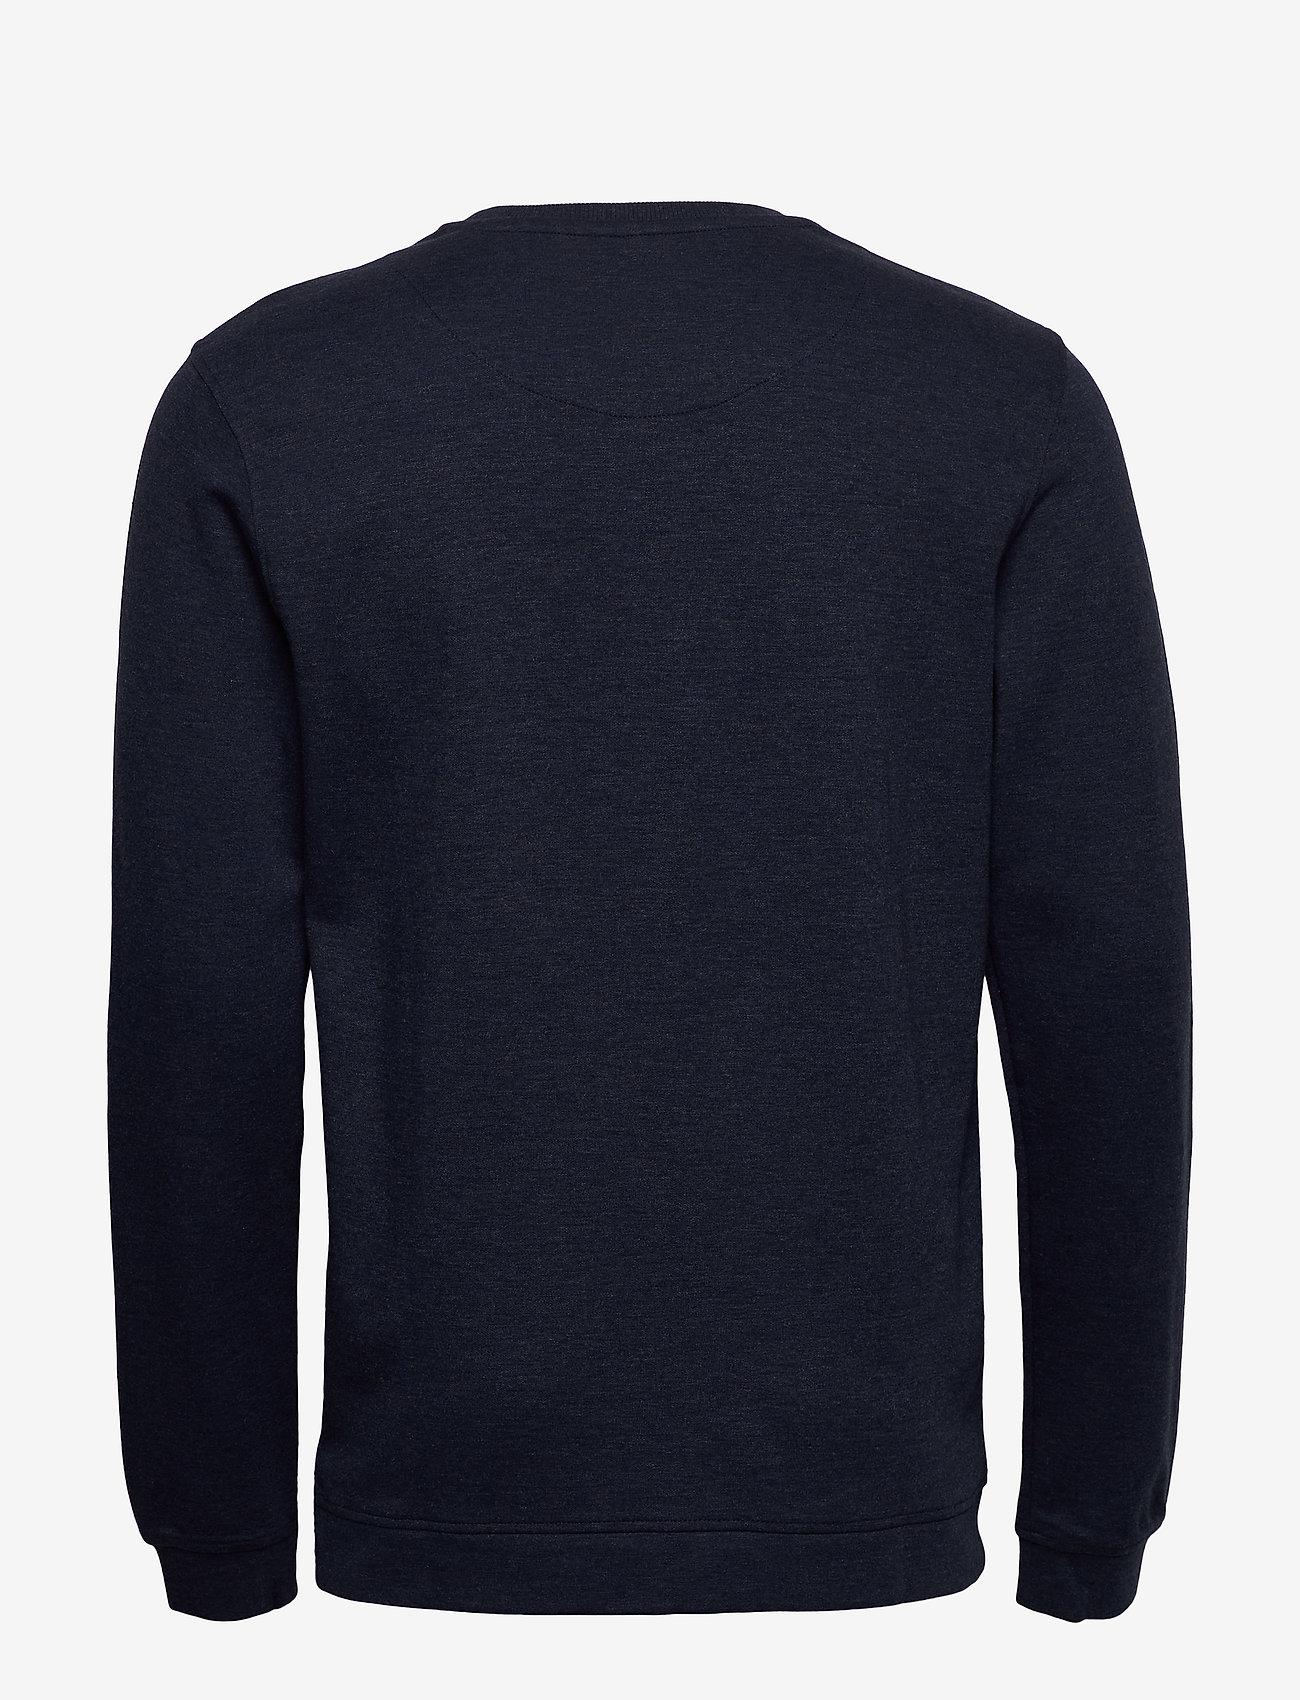 JBS of Denmark JBS of Denmark shirt bamboo - Sweatshirts NAVY - Menn Klær